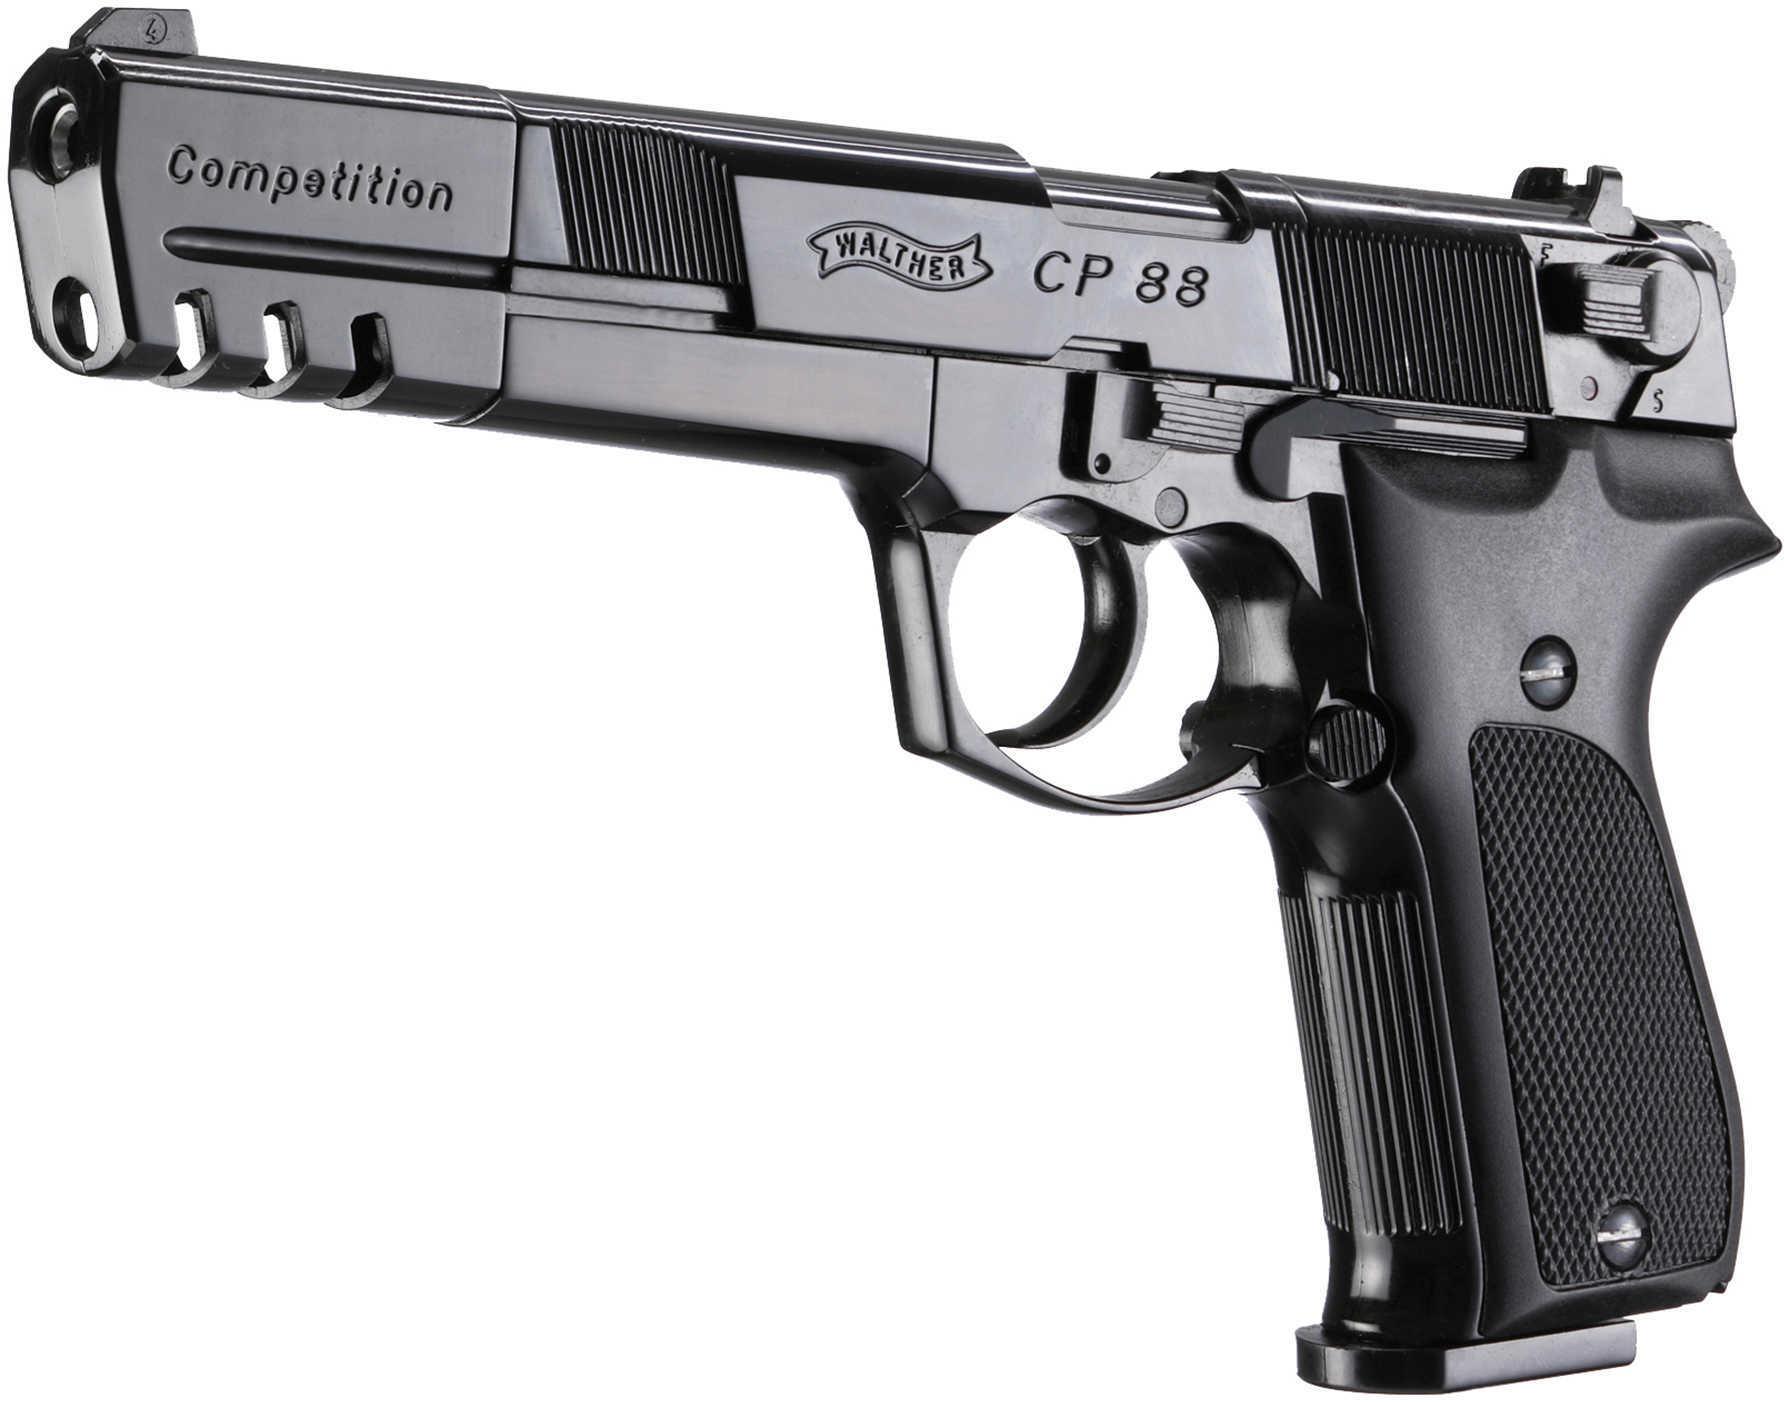 Umarex USA CP88 .177 Pellet, Black Composite Md: 225-2054